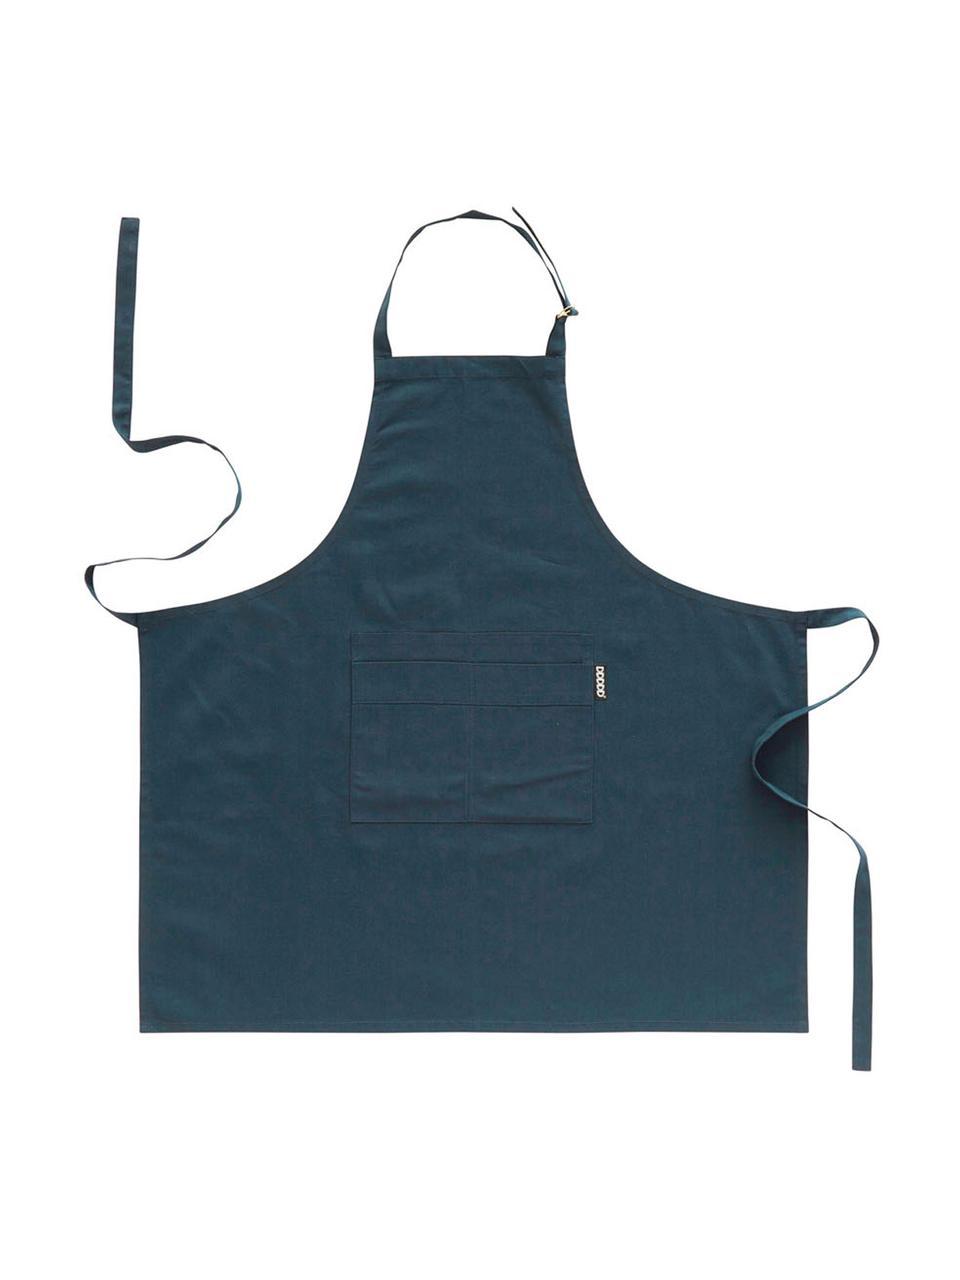 Grembiule Kit, Cotone, Blu marino, Larg. 85 x Lung. 85 cm